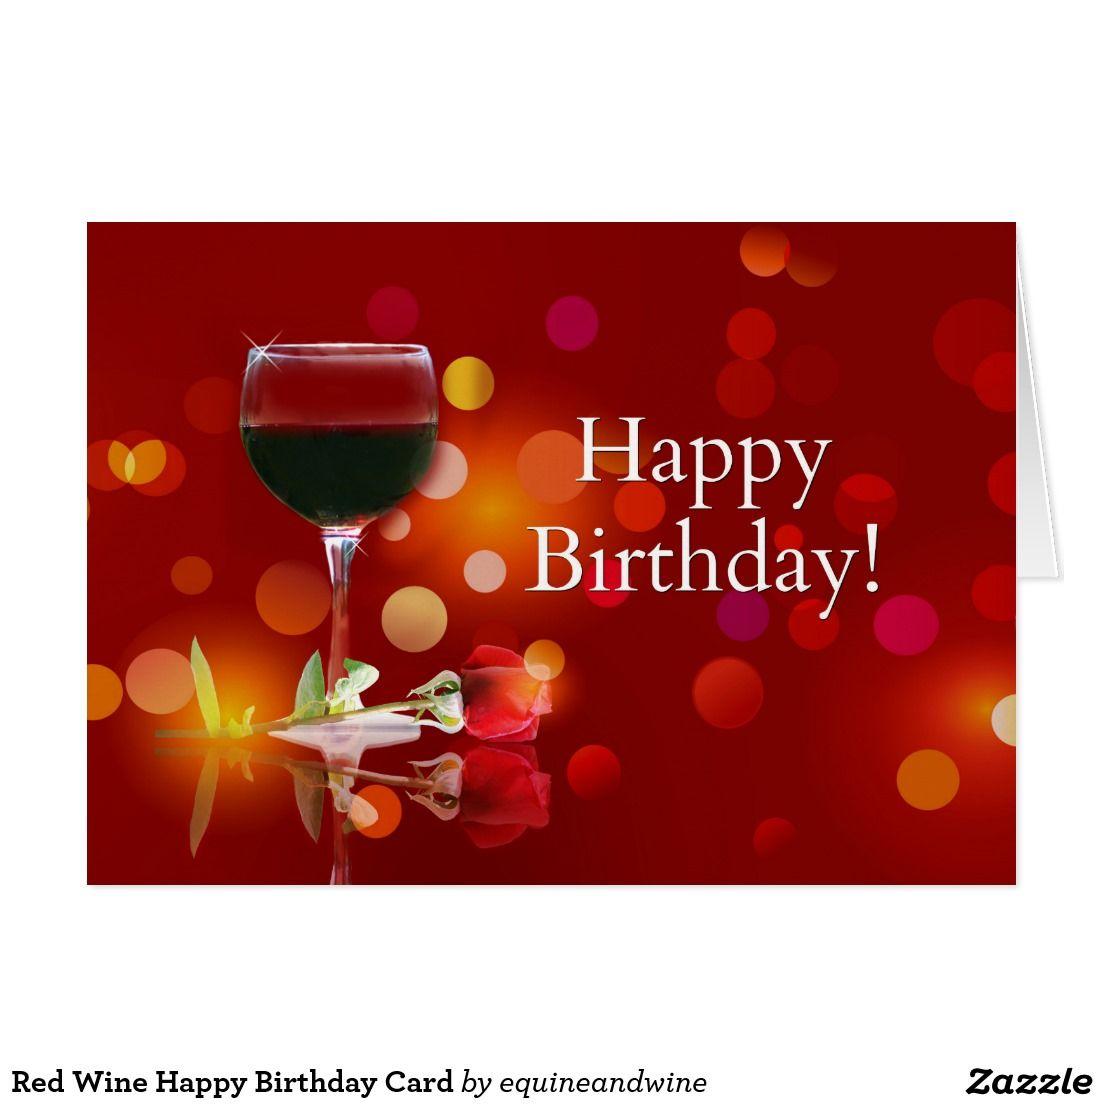 Red Wine Happy Birthday Card Zazzle Com In 2020 Happy Birthday Wine Happy Birthday Wine Images Happy Birthday Cards